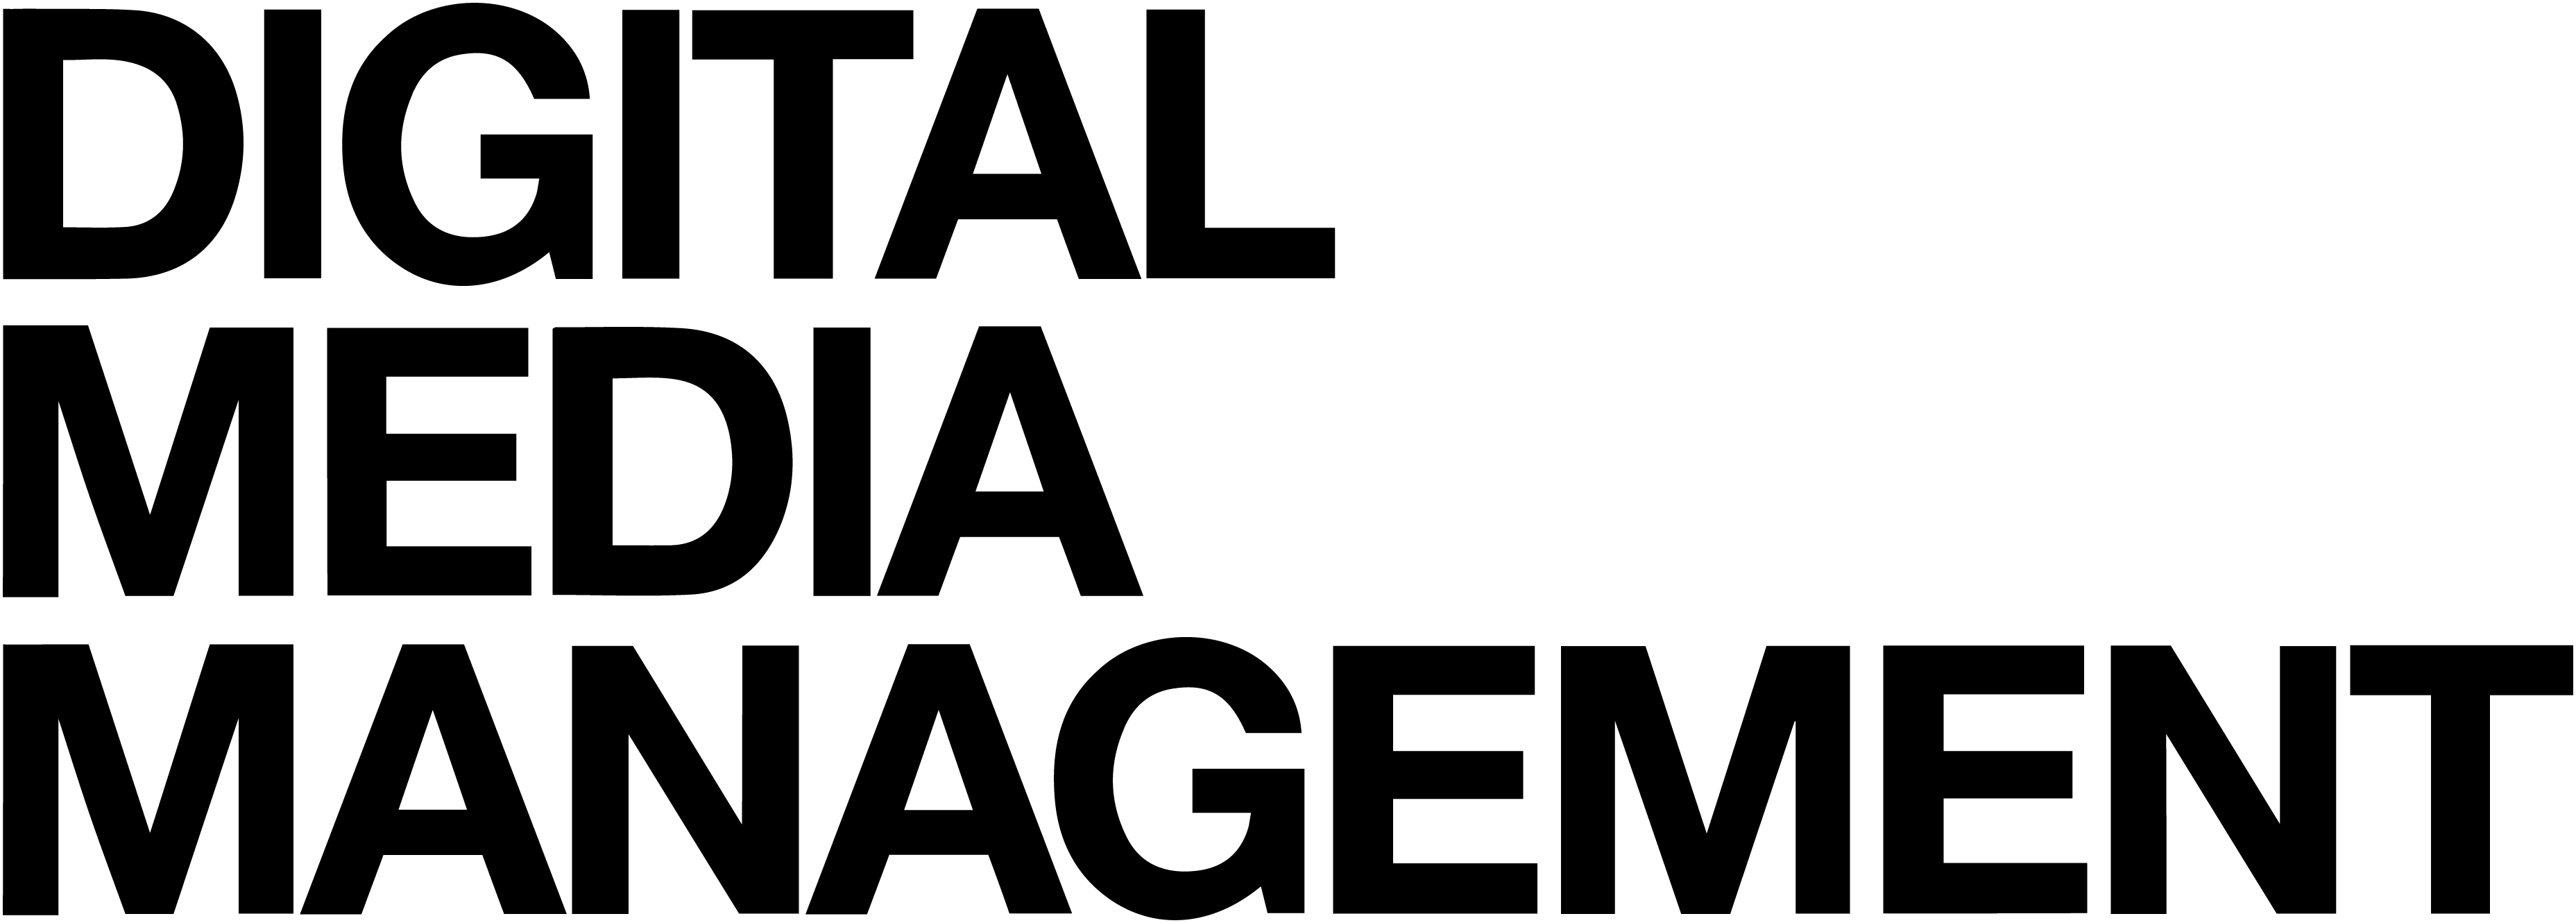 Digital Media Management logo